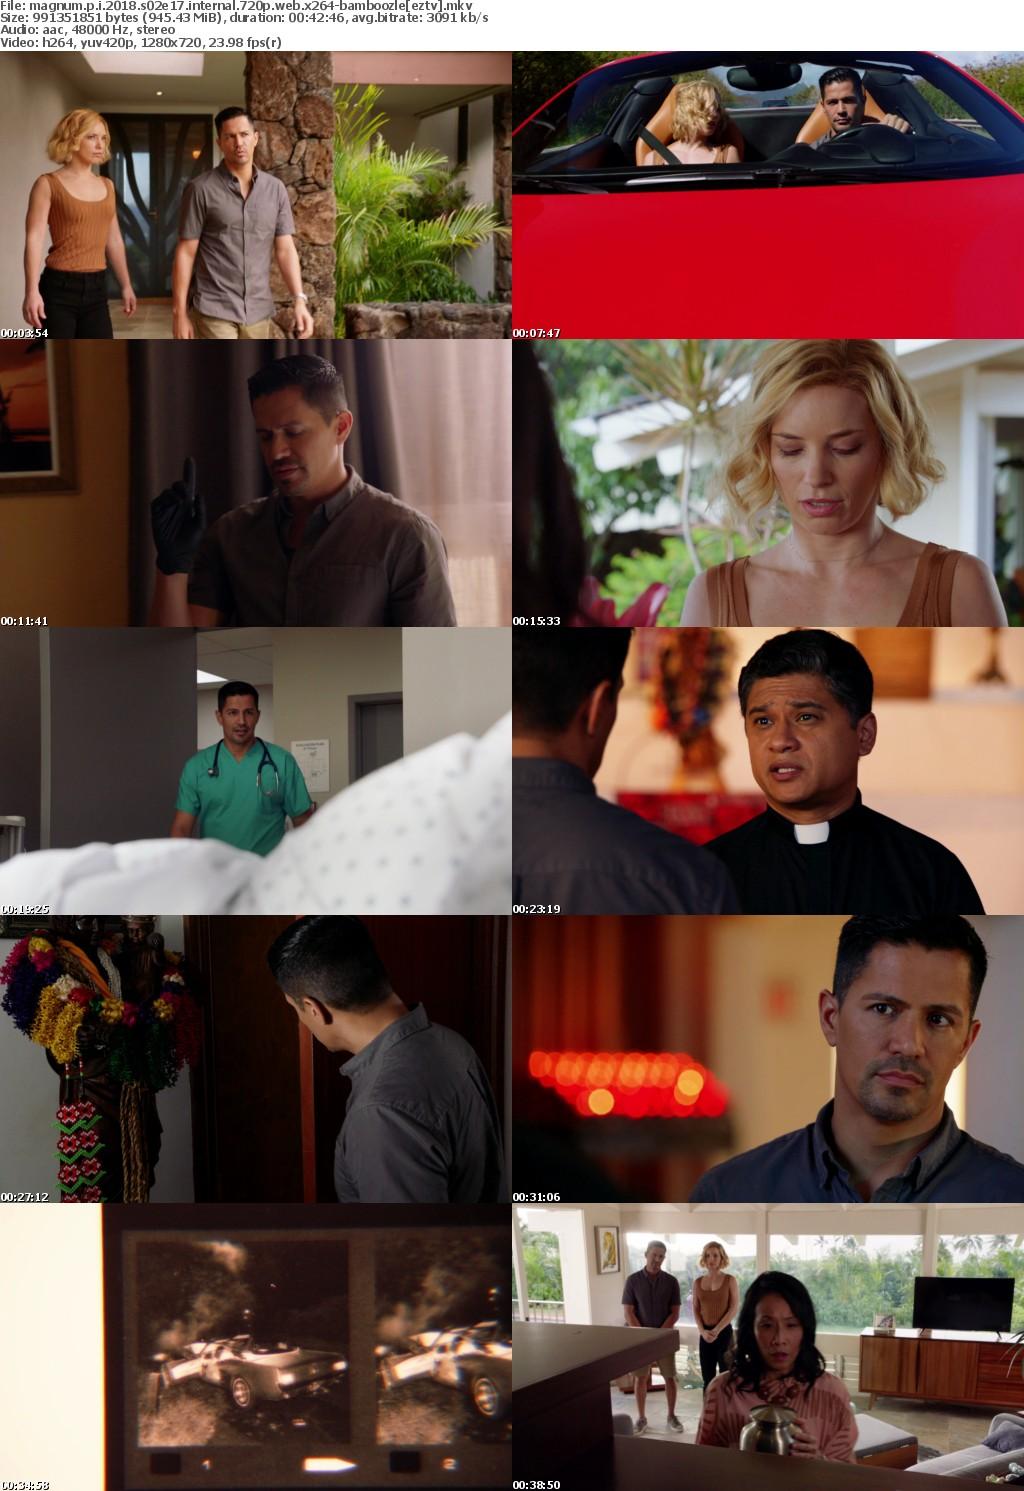 Magnum P I 2018 S02E17 iNTERNAL 720p WEB x264-BAMBOOZLE